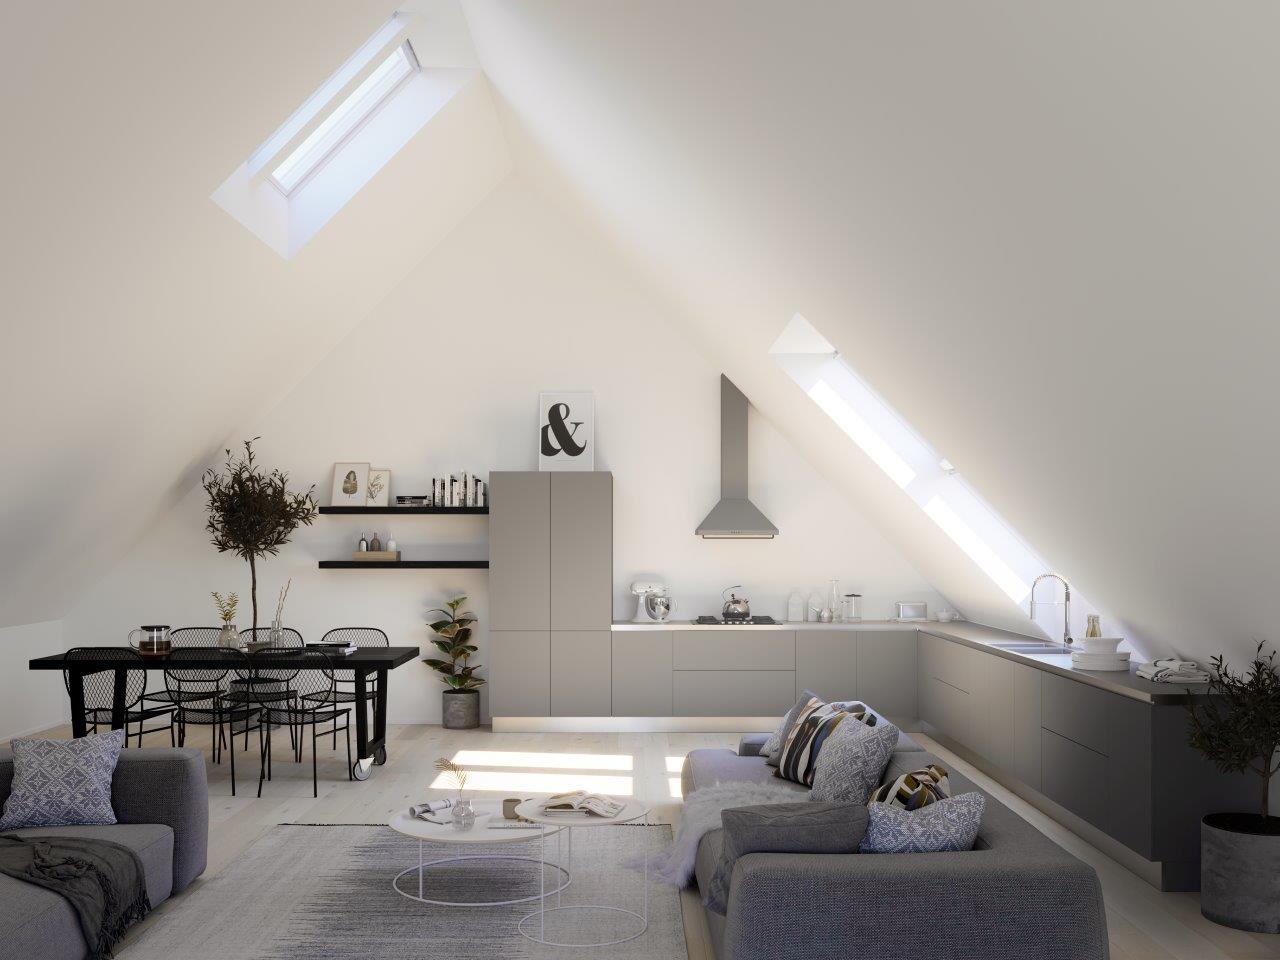 Okna dachowe w kuchni